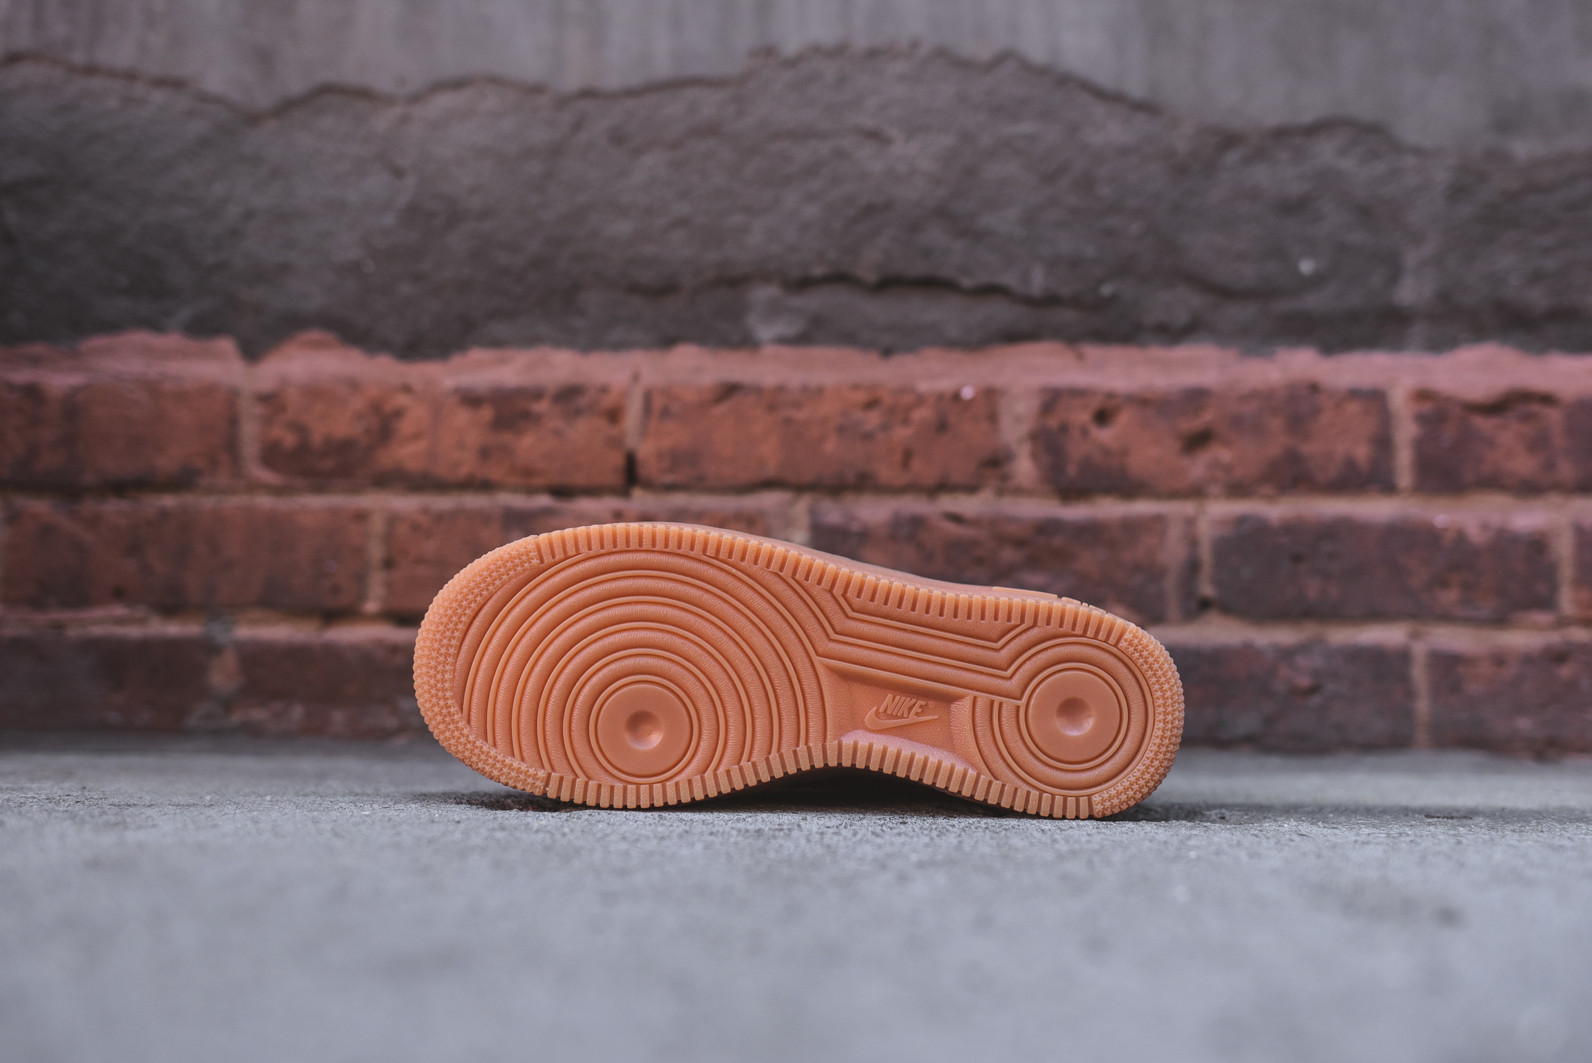 Nike Air Force 1 '07 Zapatos De Mujer De Gamuza Granate Profundo / Granate Profundo 5SNN4h